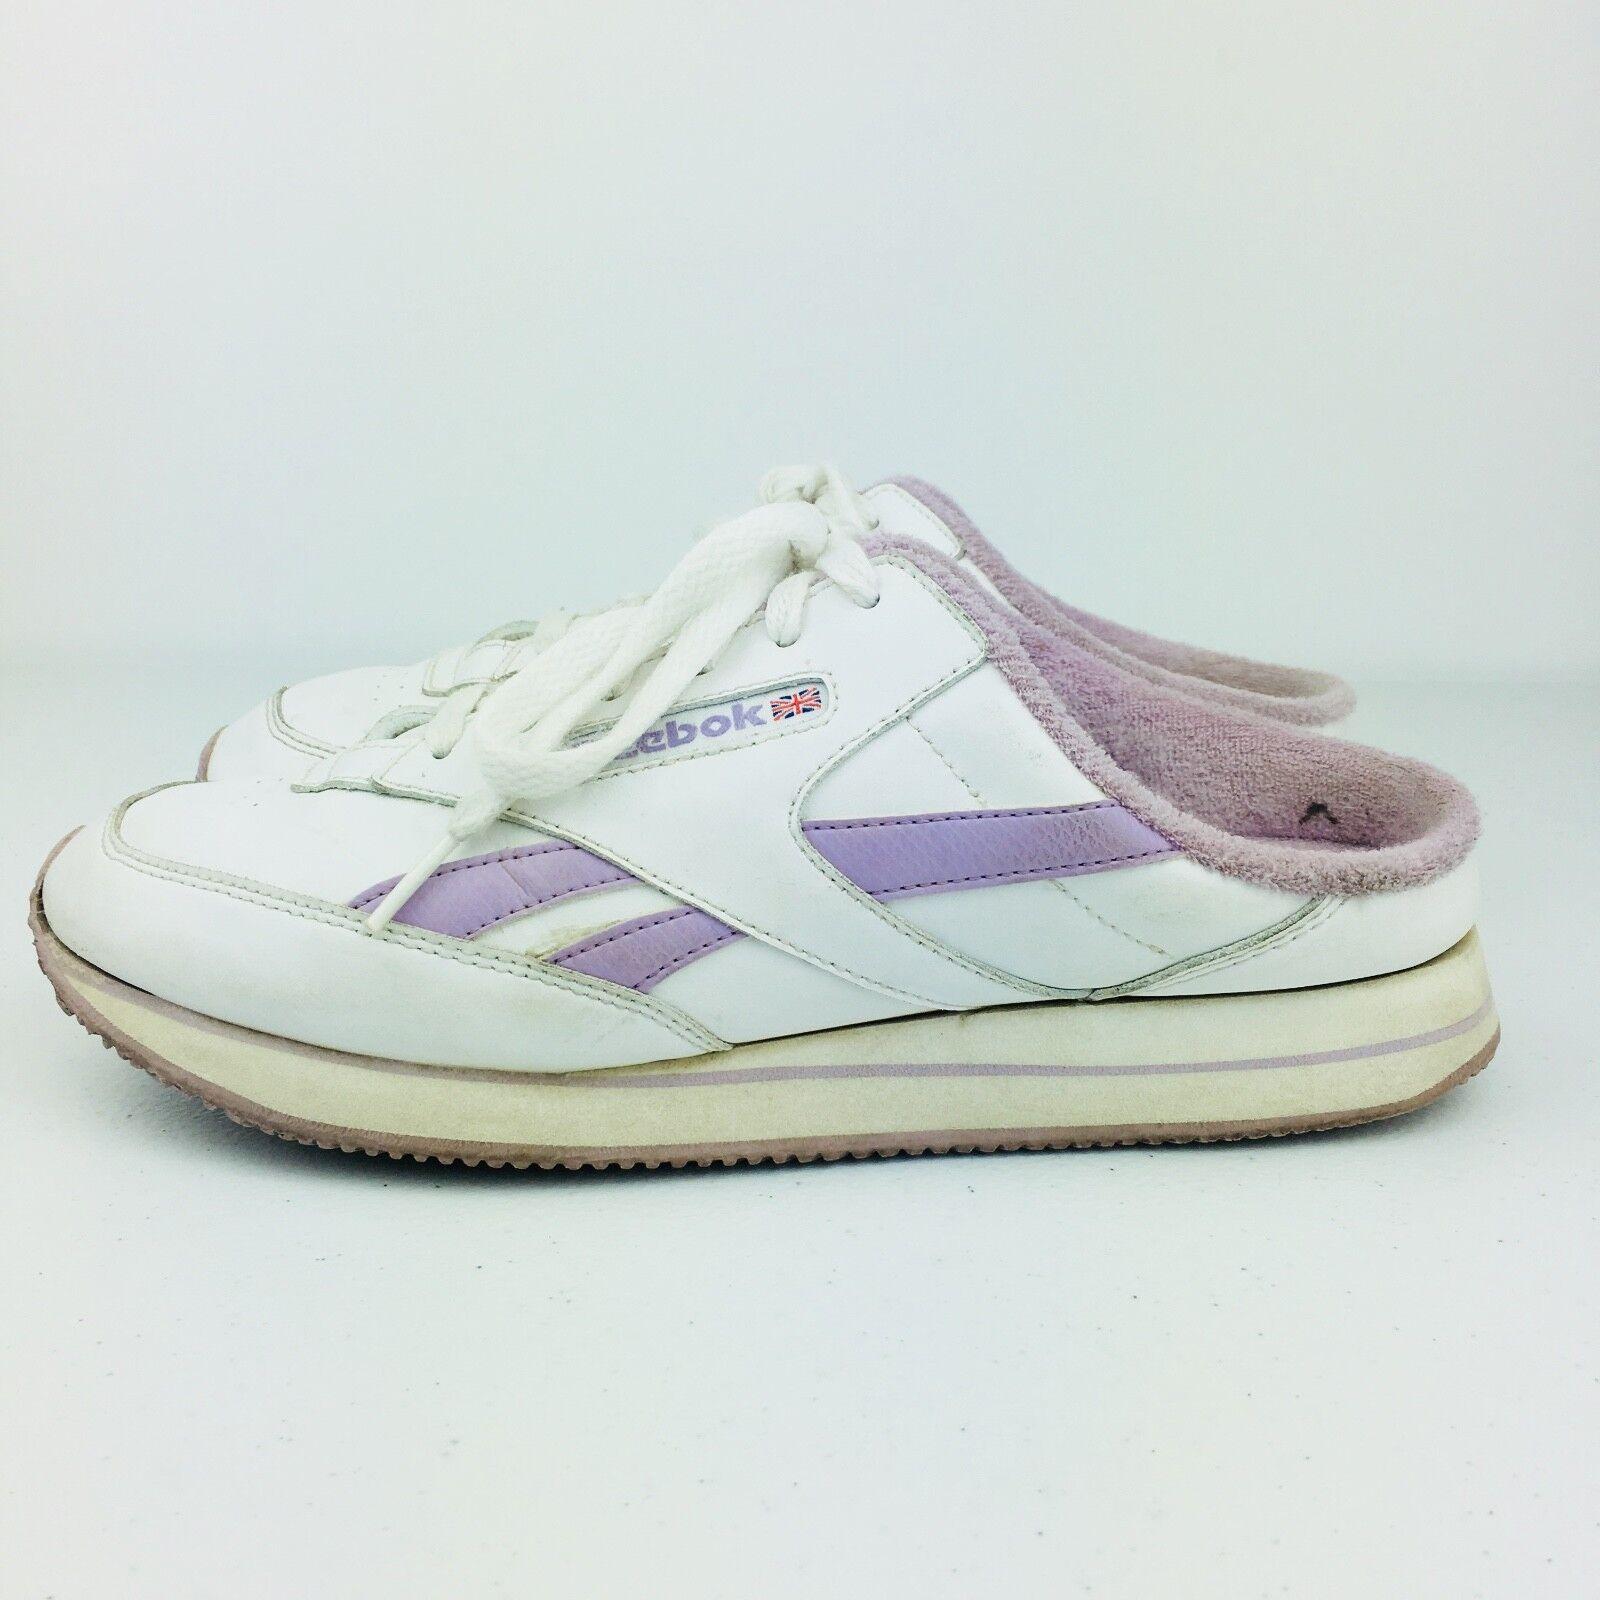 Reebok Damenschuhe Skeakers Schuhes Weiß Purple Vintage Slide Slip On Classic Vintage Purple 80s 90s 517e61